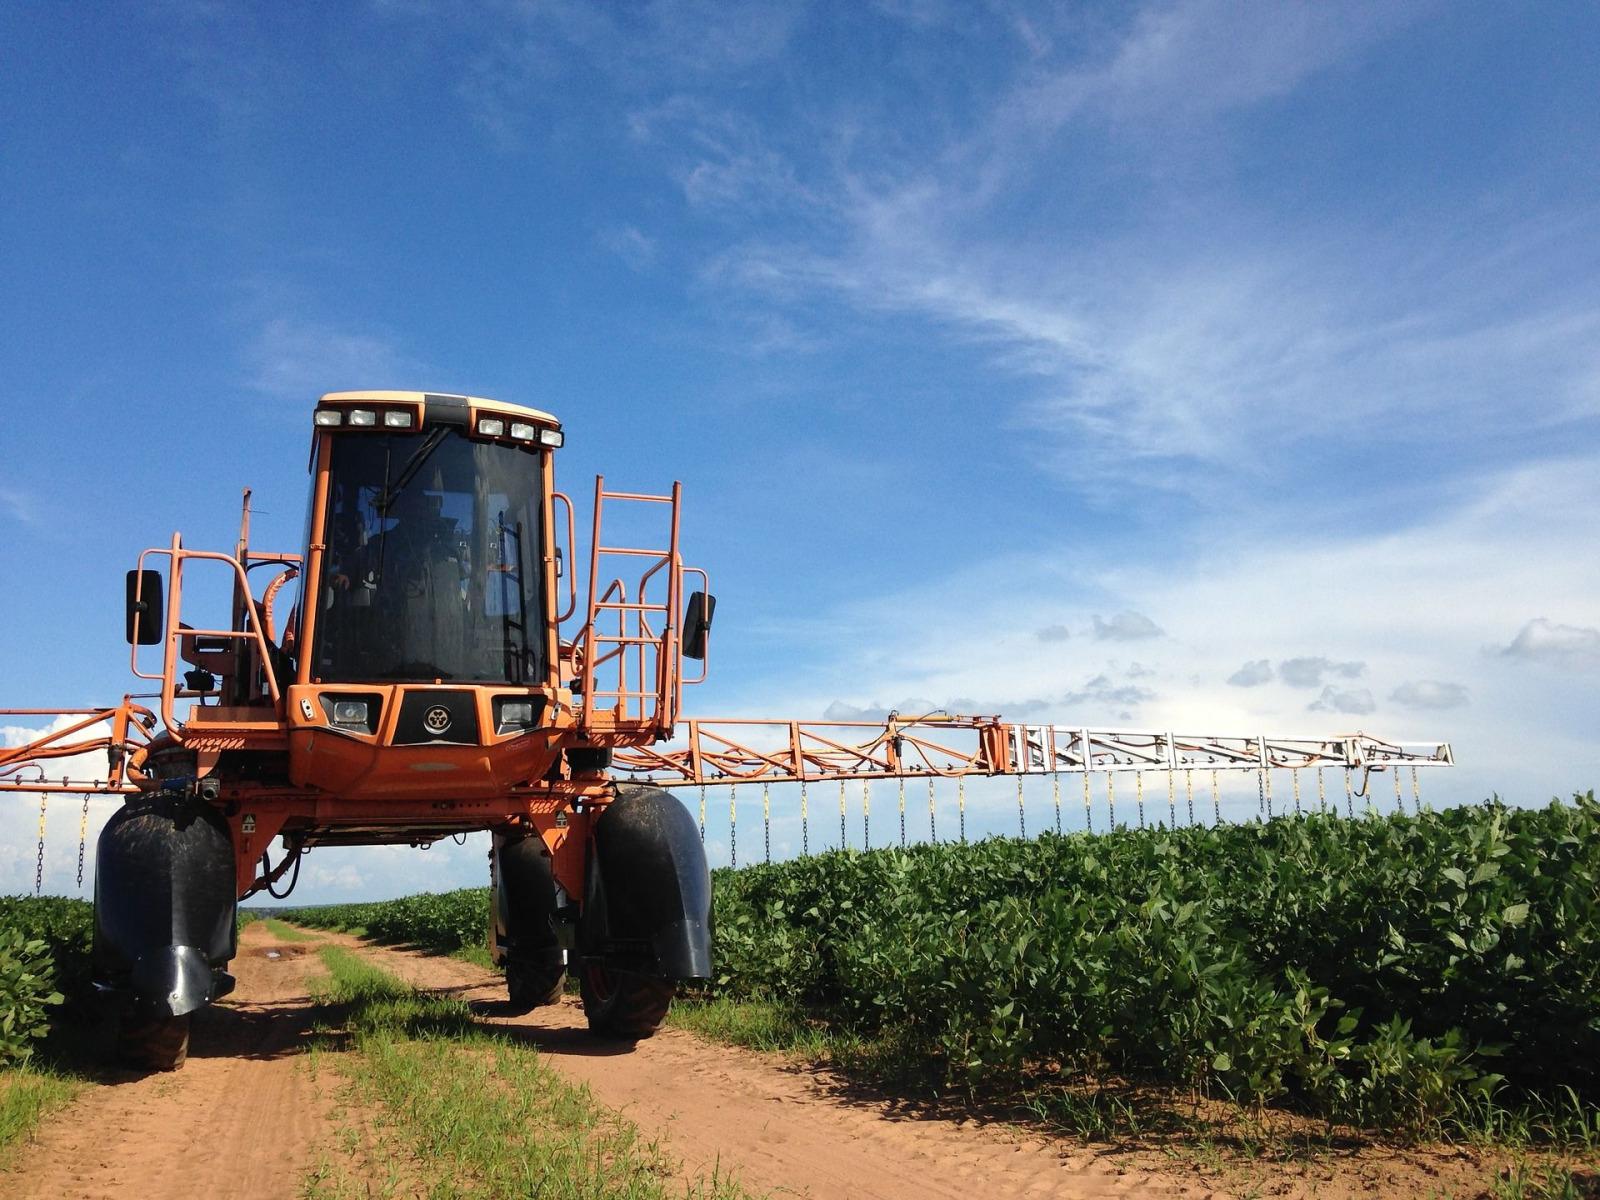 pestizid traktor poison emersonbegnini pixabay